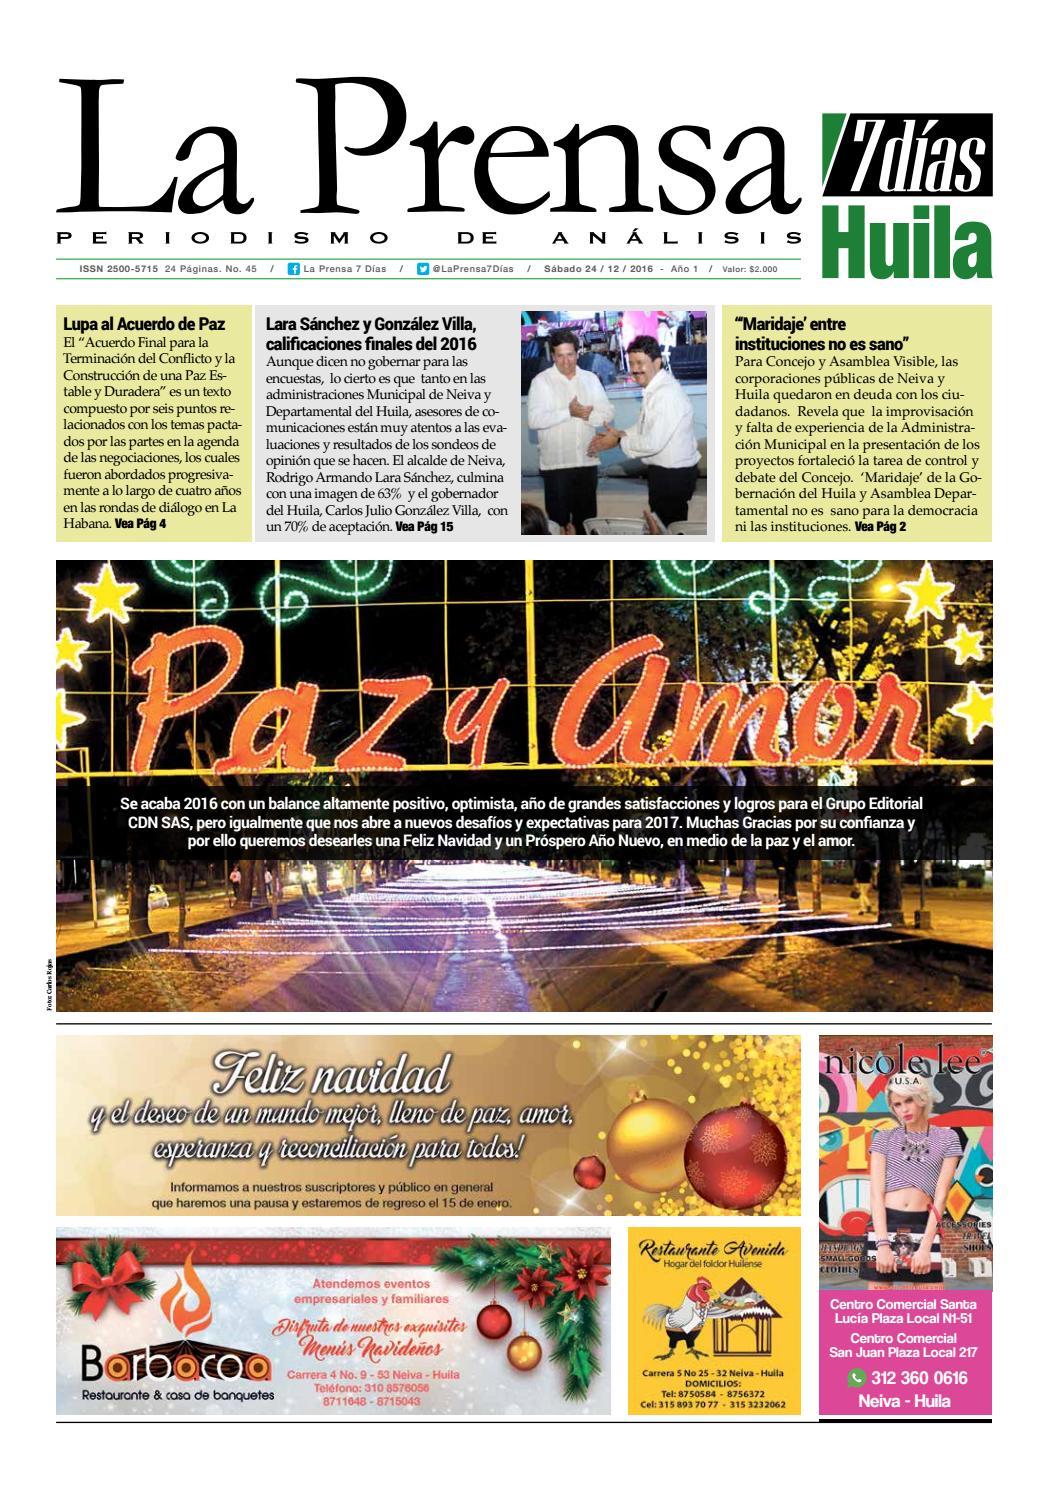 La prensa 24-12-2016 by LA PRENSA 7 DIAS - issuu